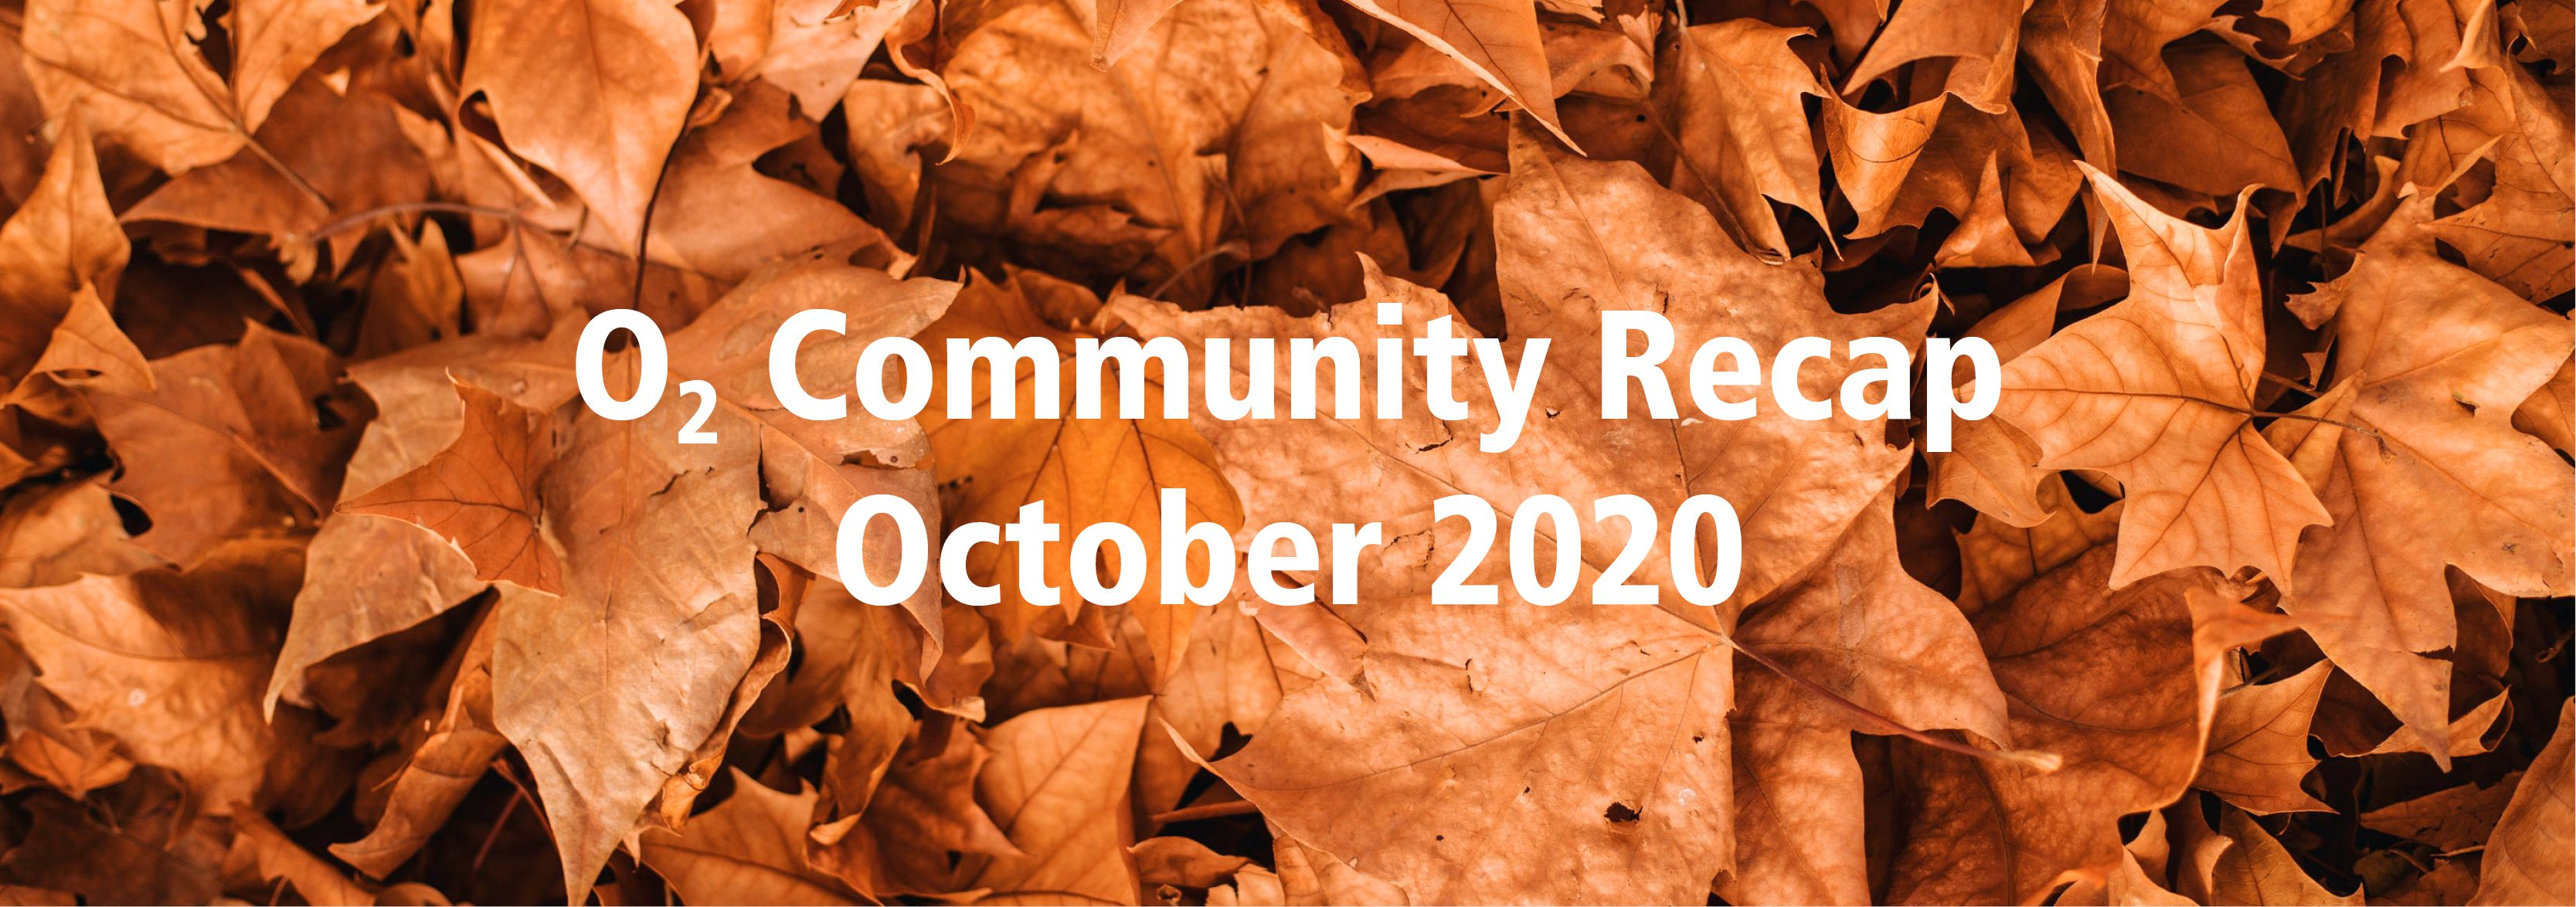 community-recap-oct2020.jpg